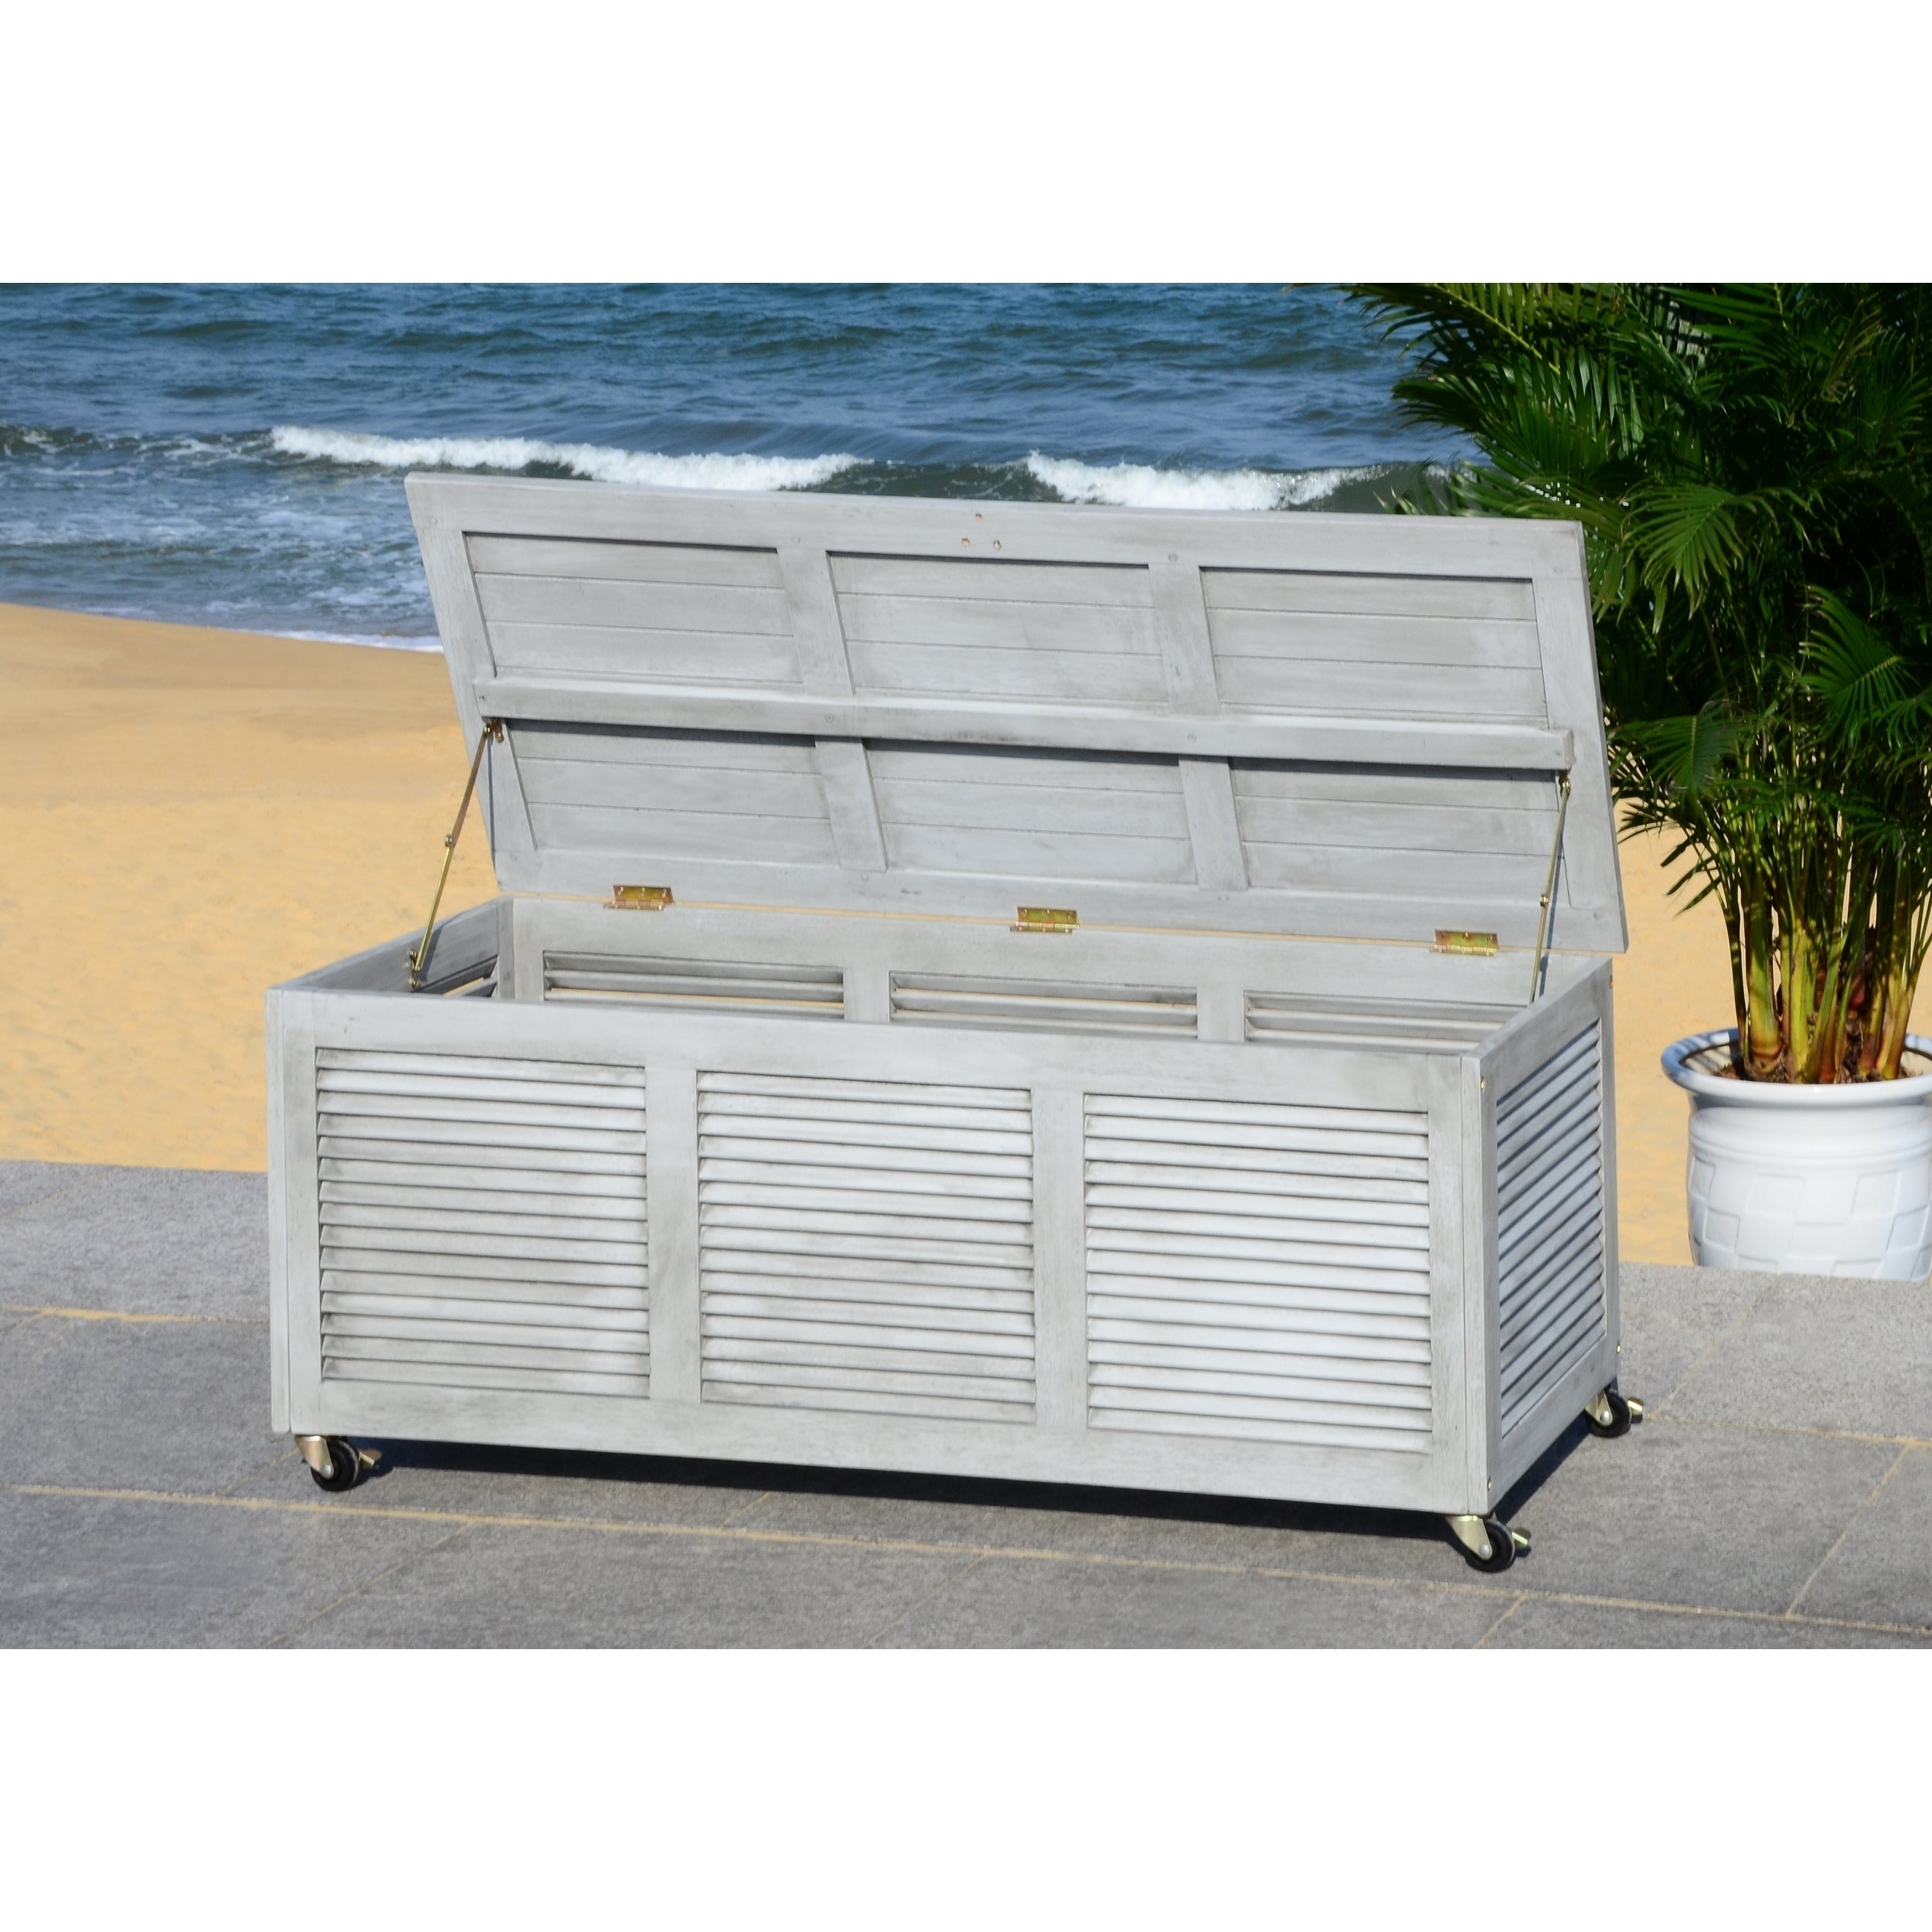 Fabulous Safavieh Outdoor Elina 47 2 Inch Grey Wash Cushion Storage Box Inzonedesignstudio Interior Chair Design Inzonedesignstudiocom